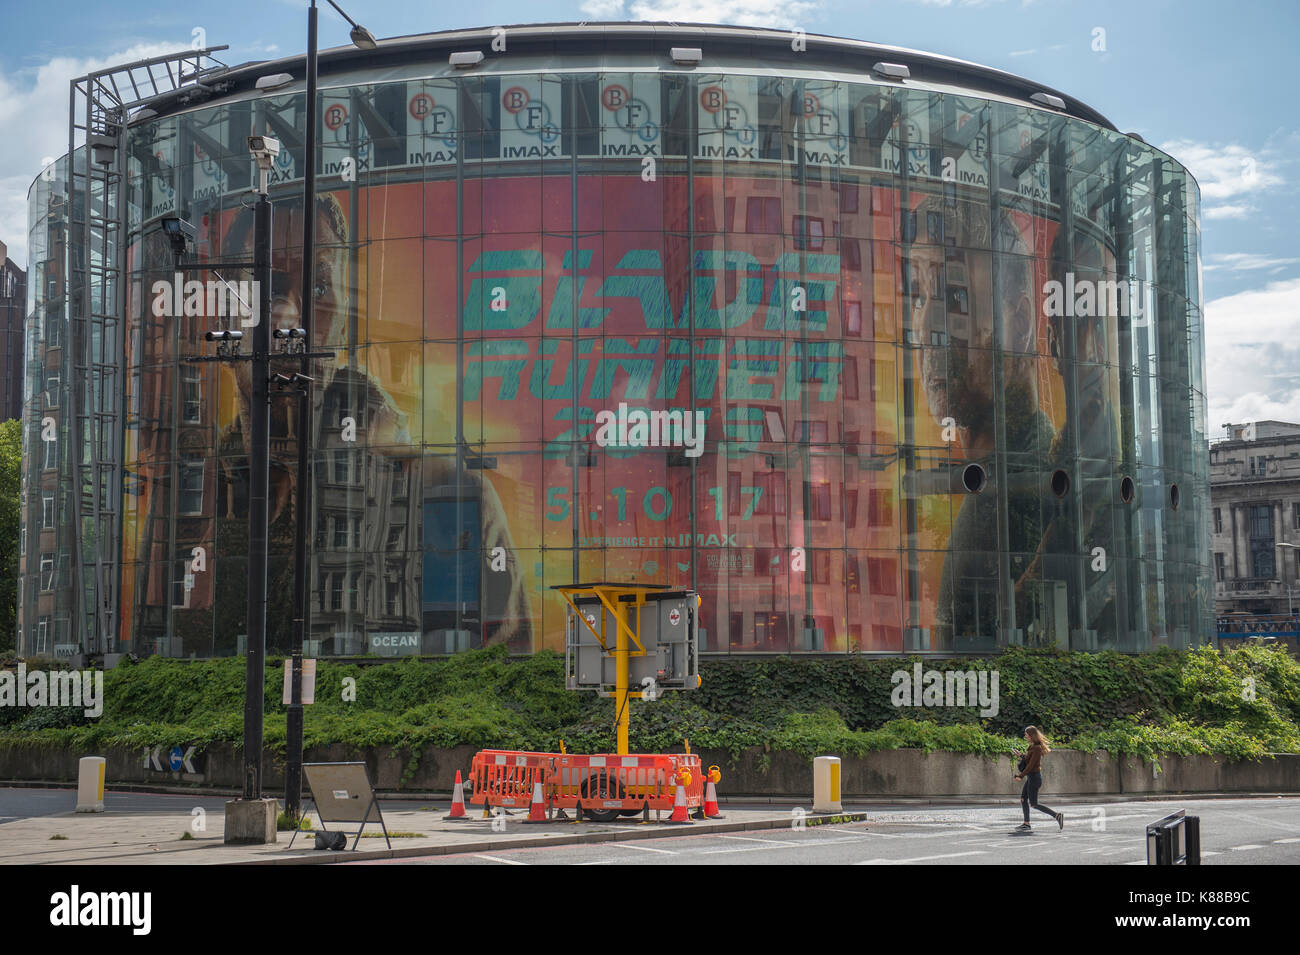 Blade Runner 2049 promotion at BFI Imax, the UKs biggest cinema screen at Waterloo, London, UK. Credit: Malcolm Park/Alamy. - Stock Image